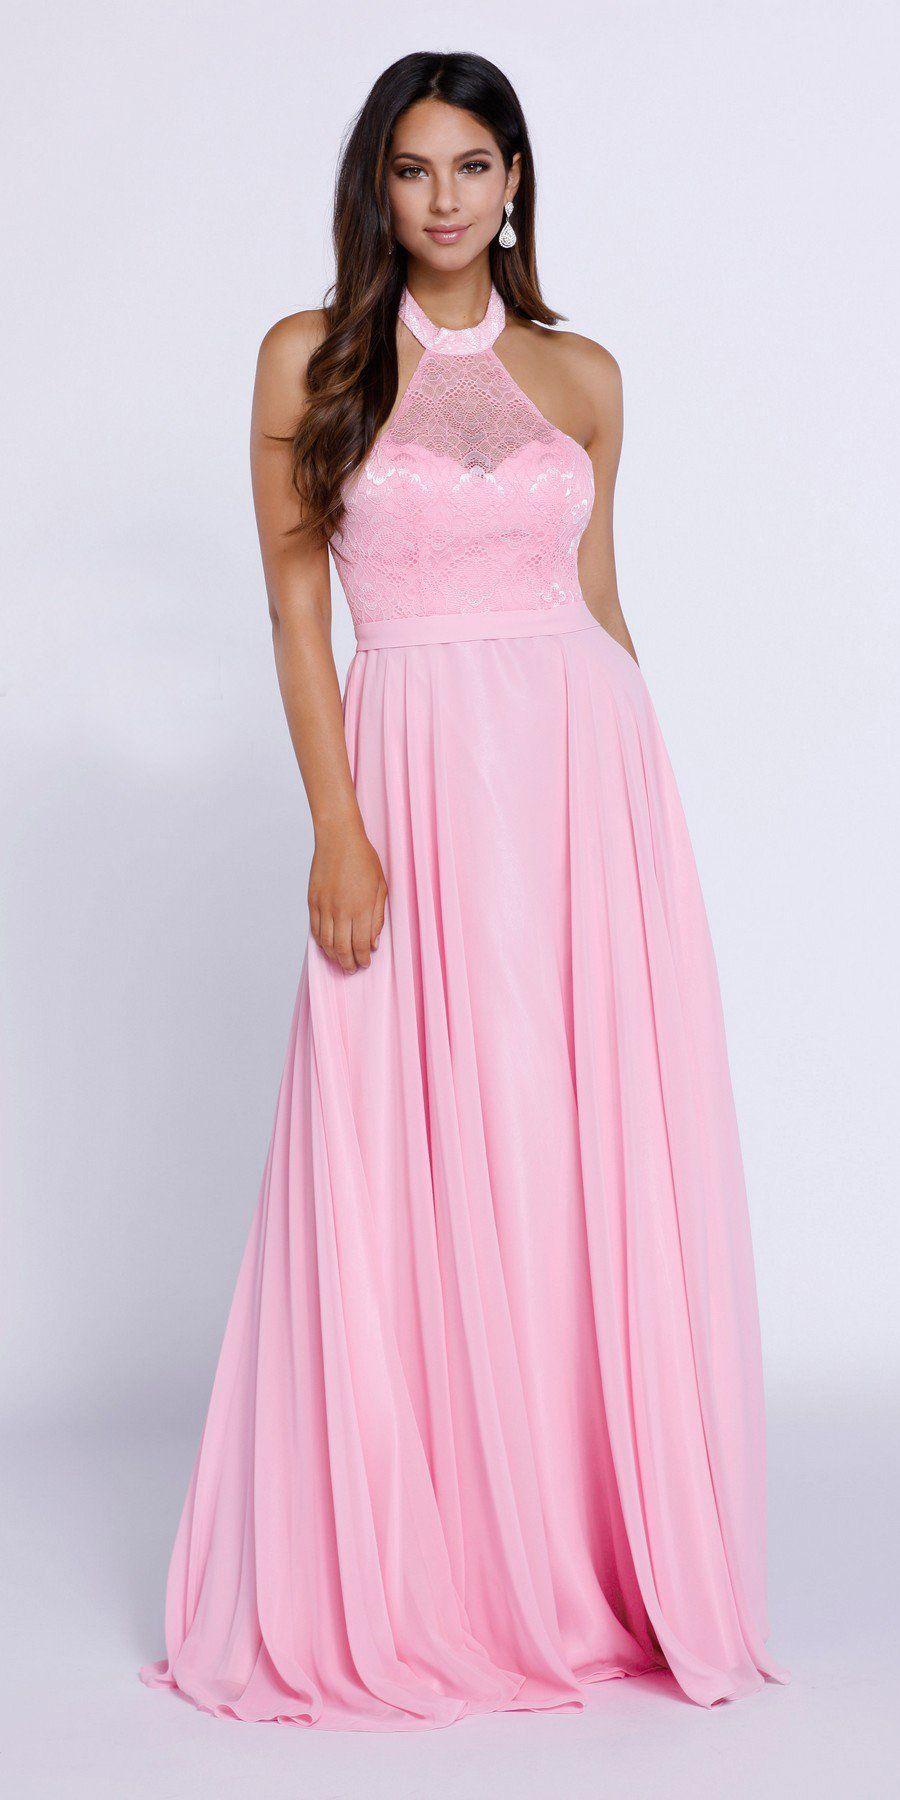 Baby pink high neck halter top prom dress chiffon illusion neck